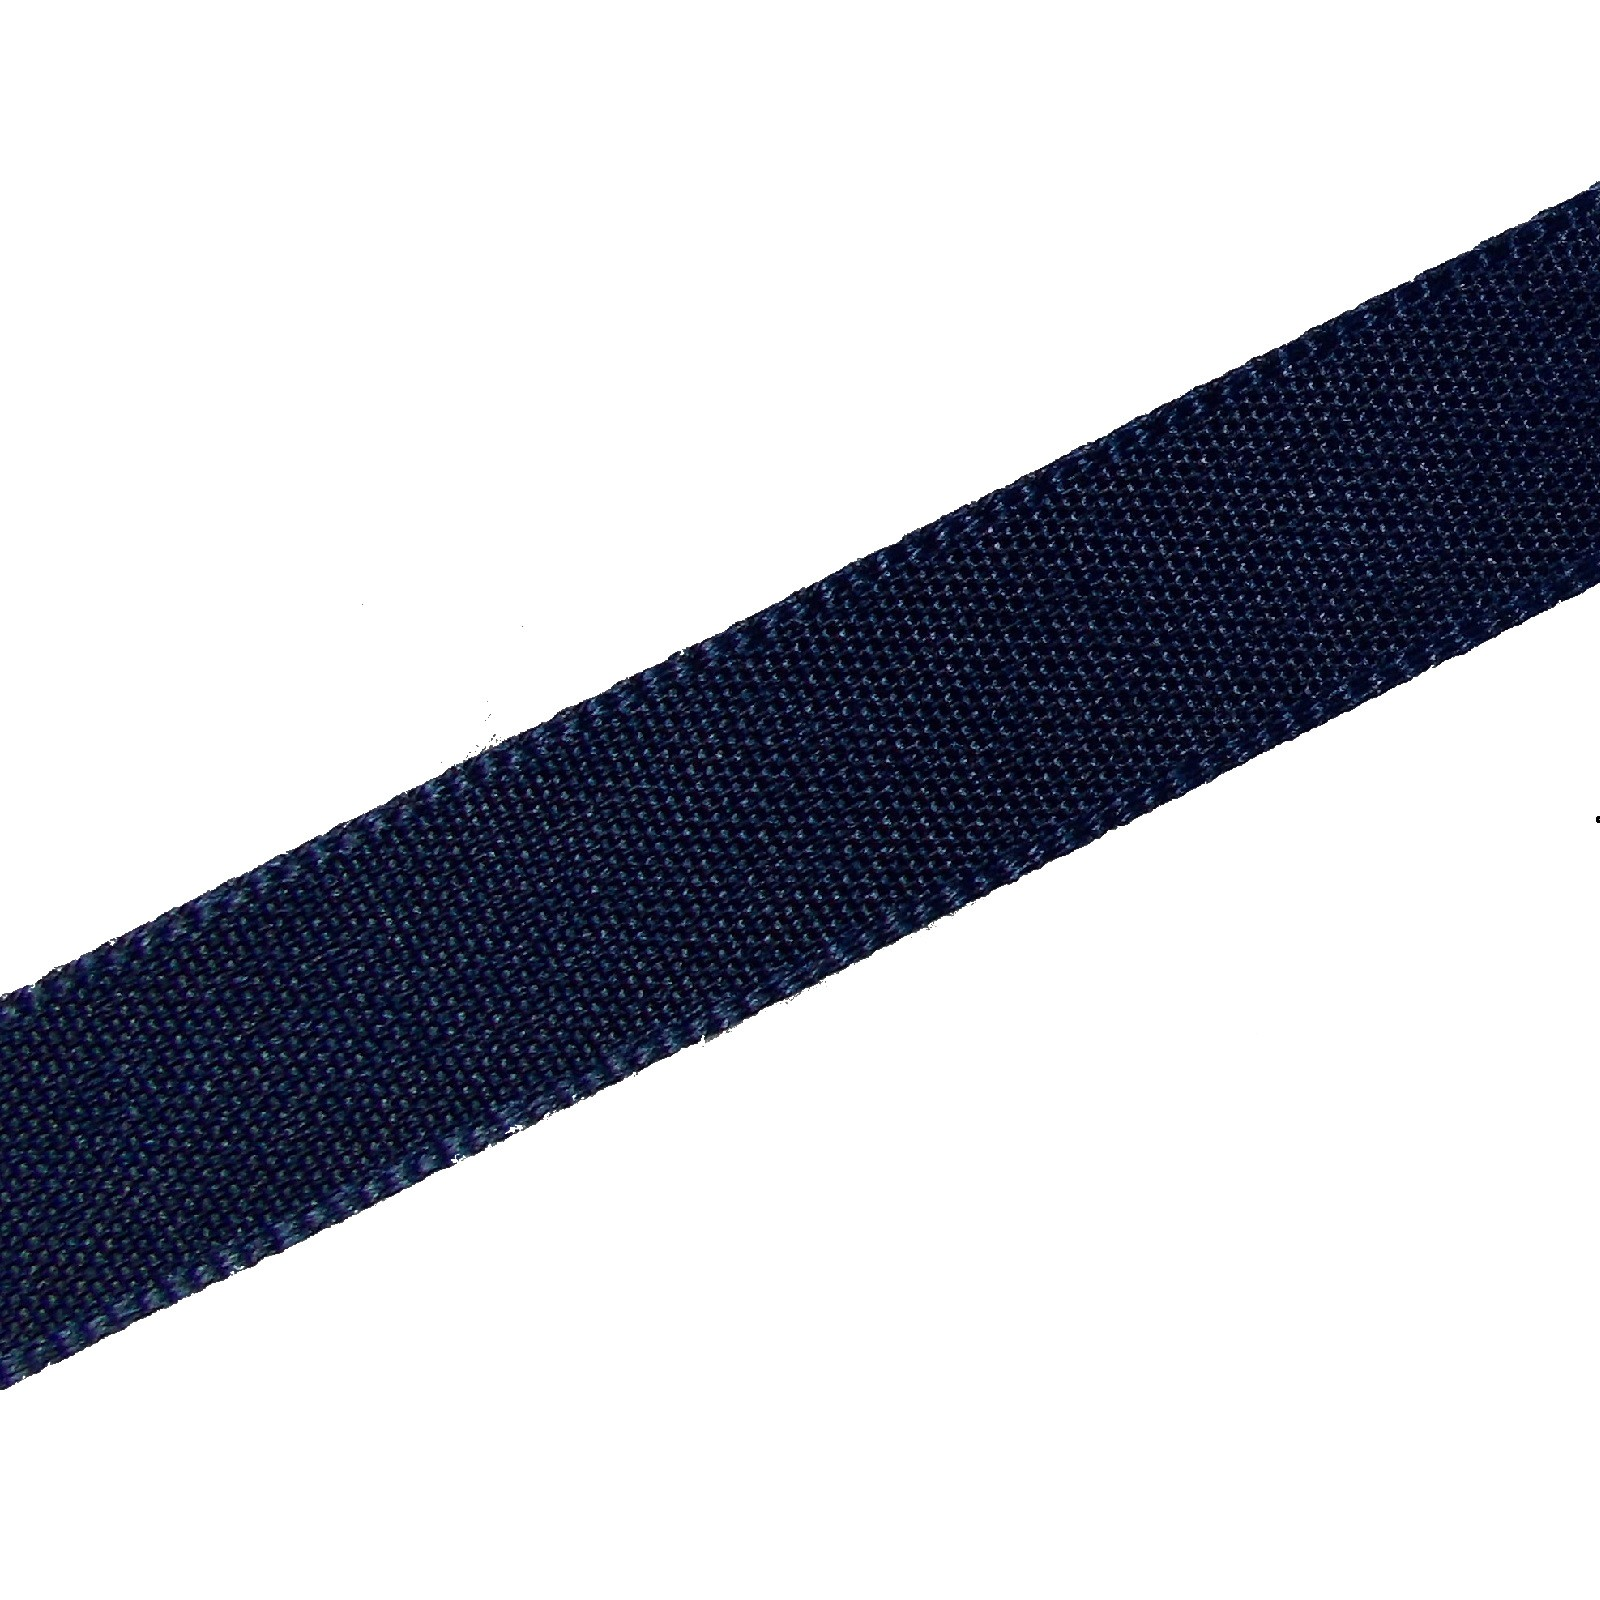 Berisfords Seam Binding Polyester Ribbon Tape 25mm wide Navy Blue 1 metre length